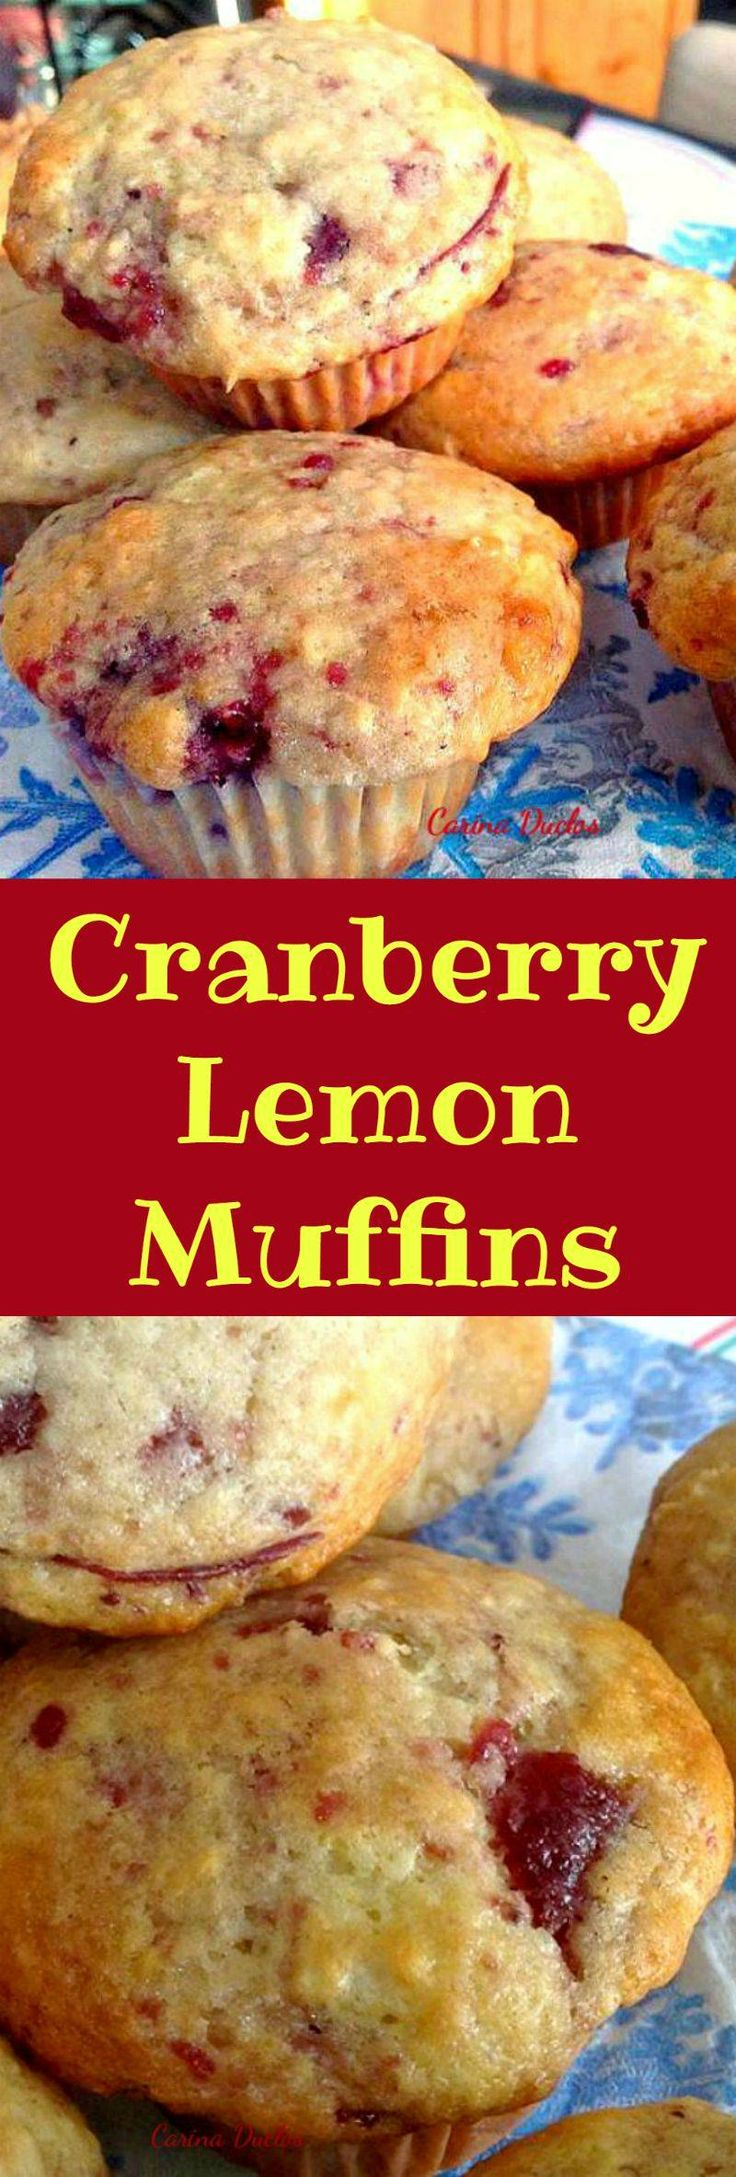 Lemon Cranberry Muffins Recipe — Dishmaps